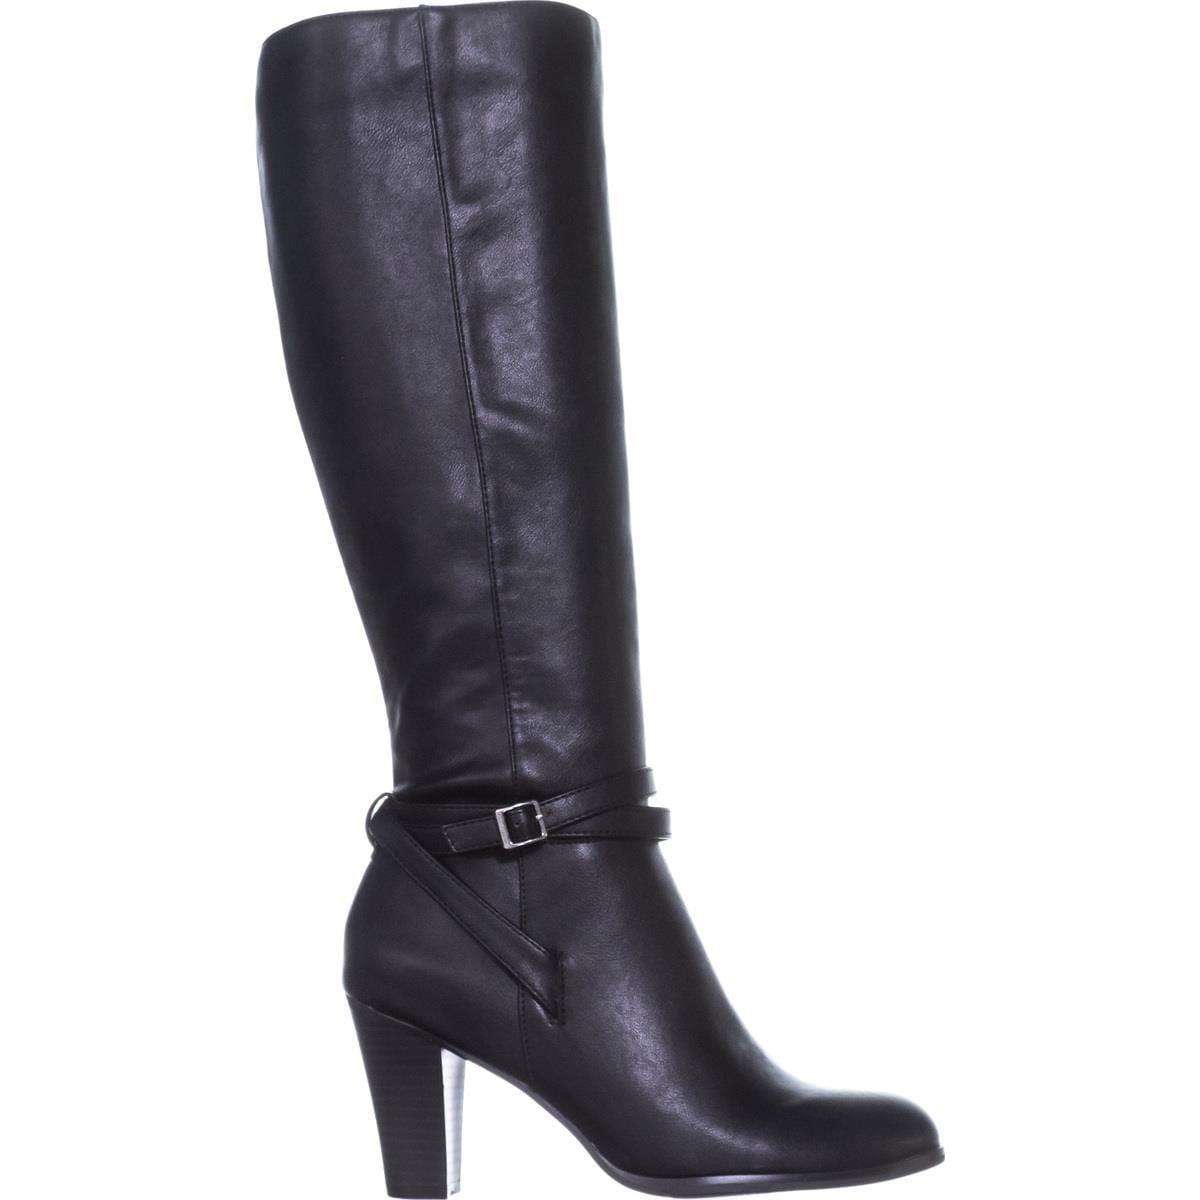 74f2a40b6cf7 Shop GB35 Beckyy Knee-High Boots